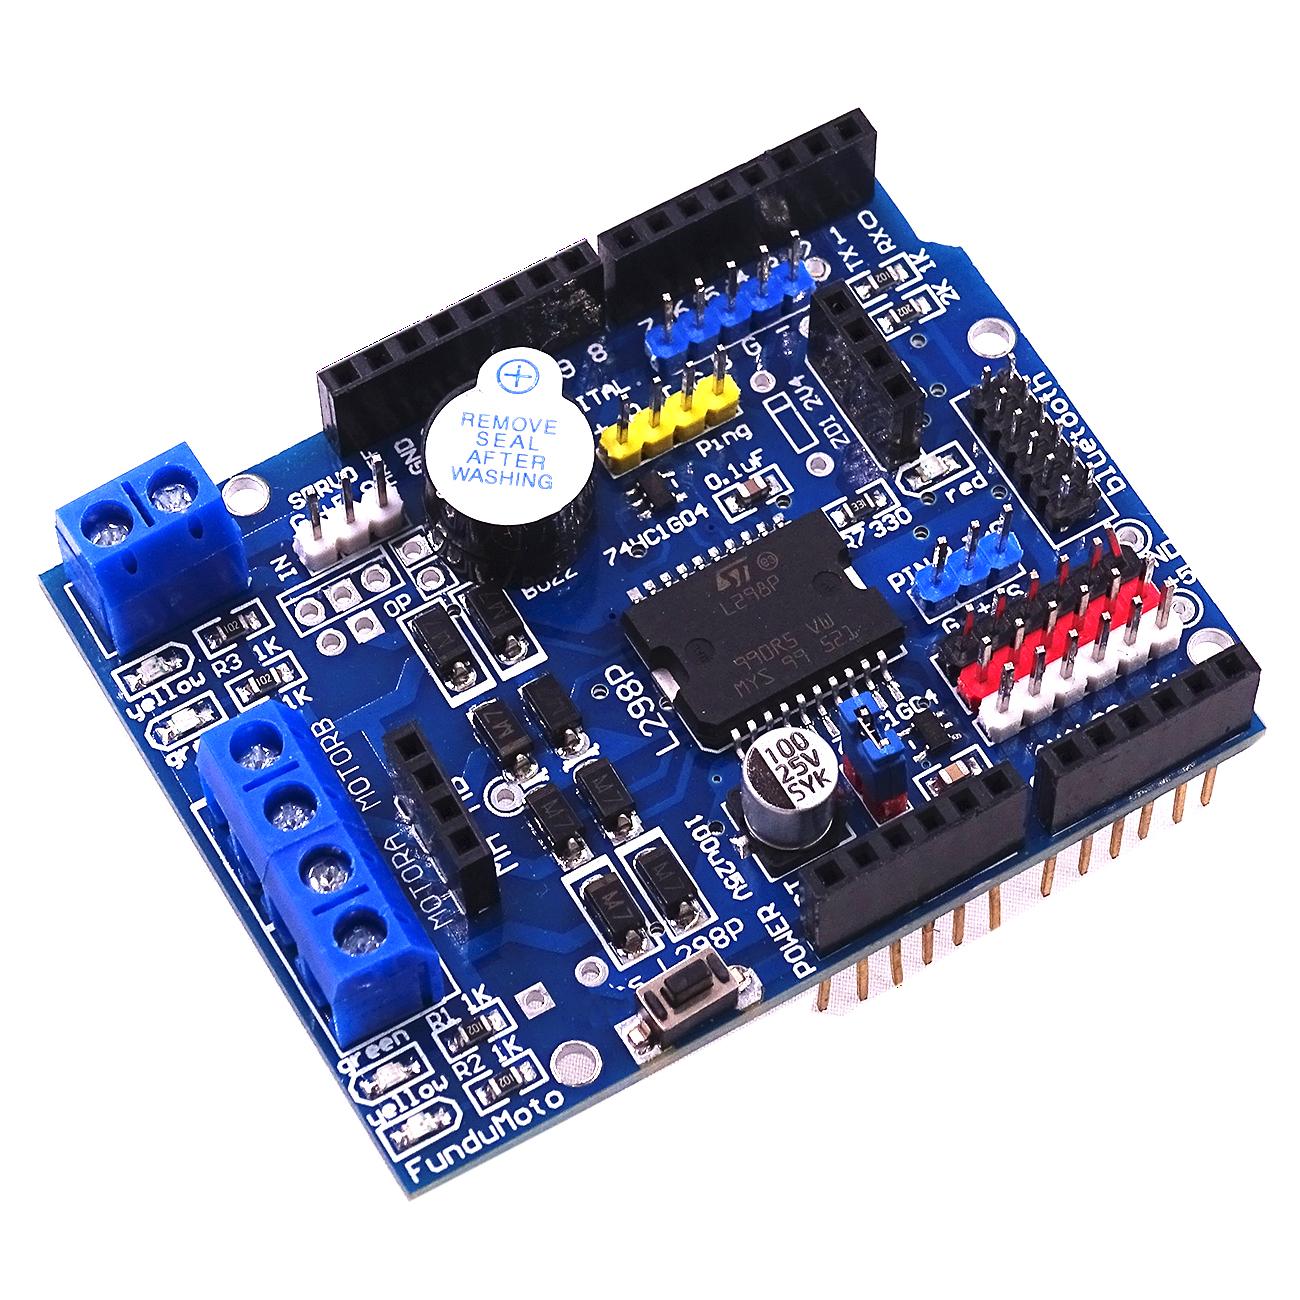 L298P Motor Shield Board